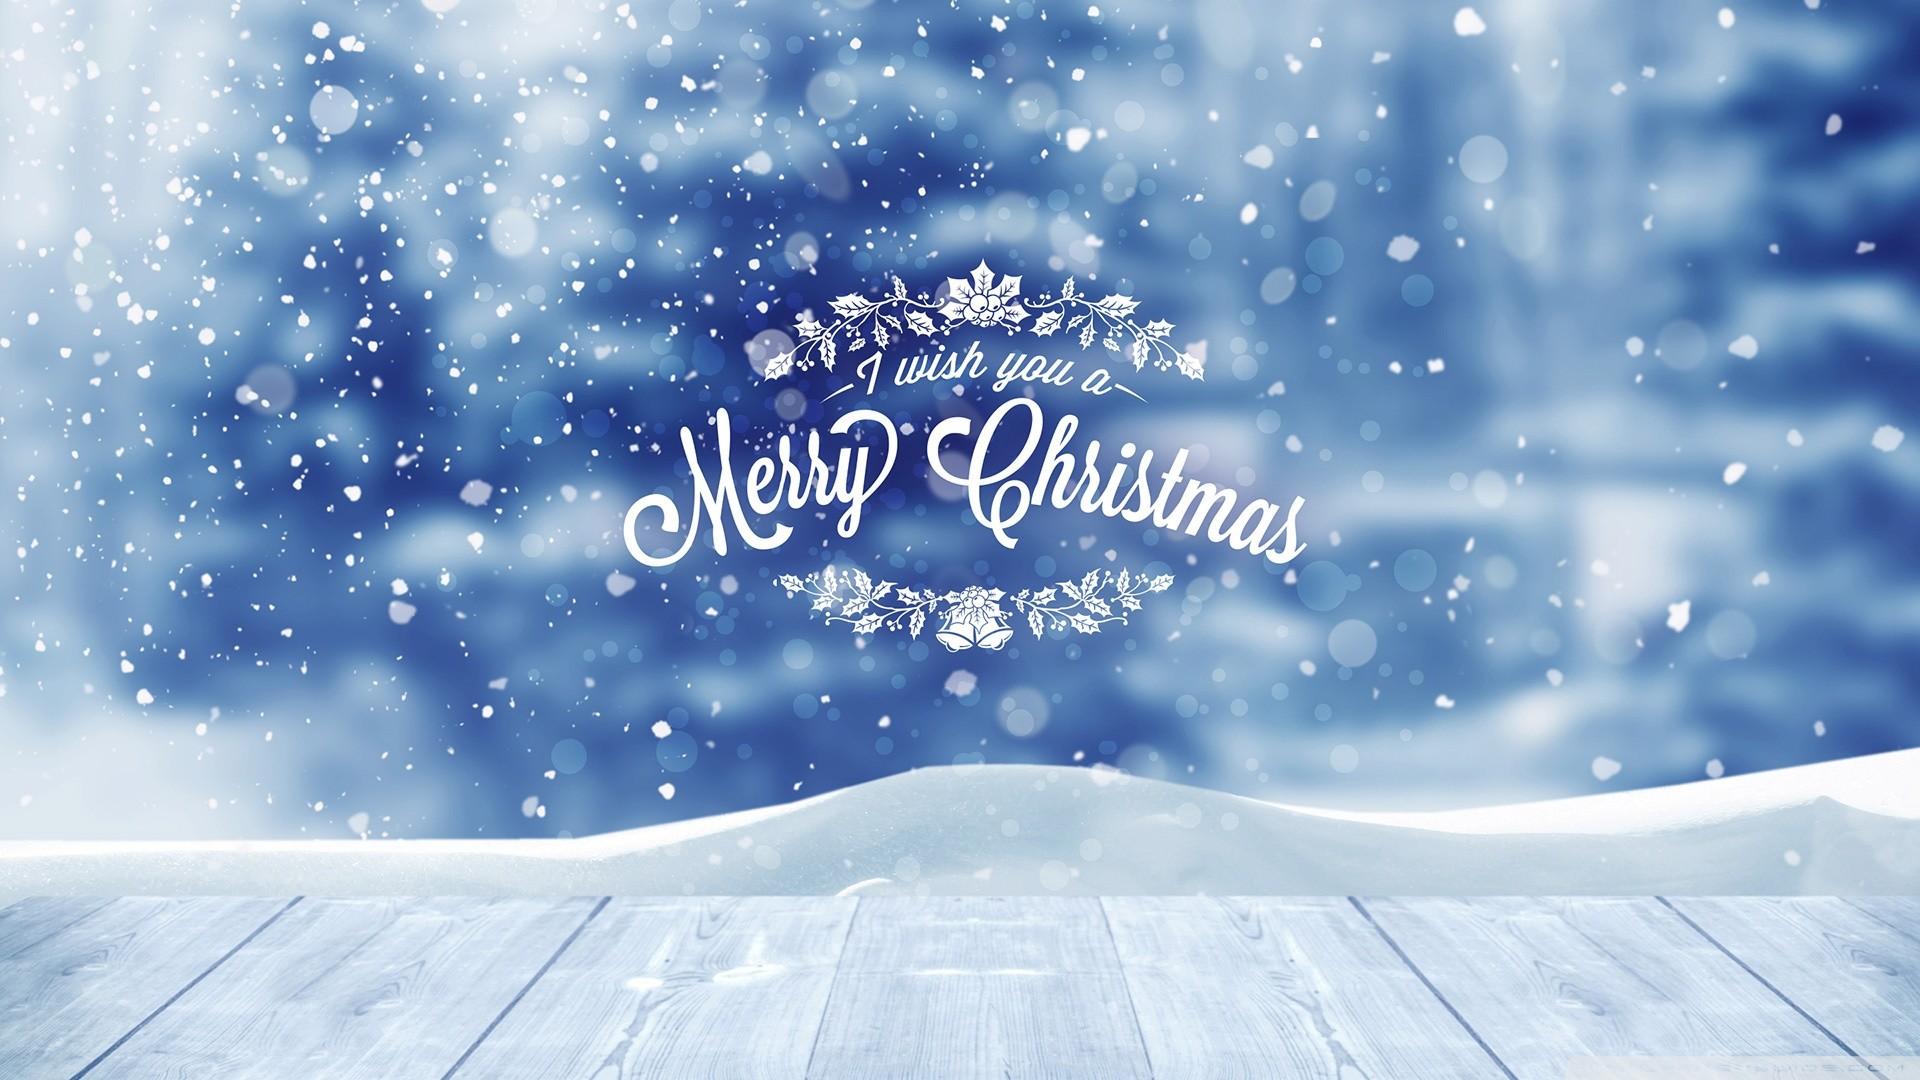 Christmas Hd Widescreen Wallpaper 1920x1080 61 Images